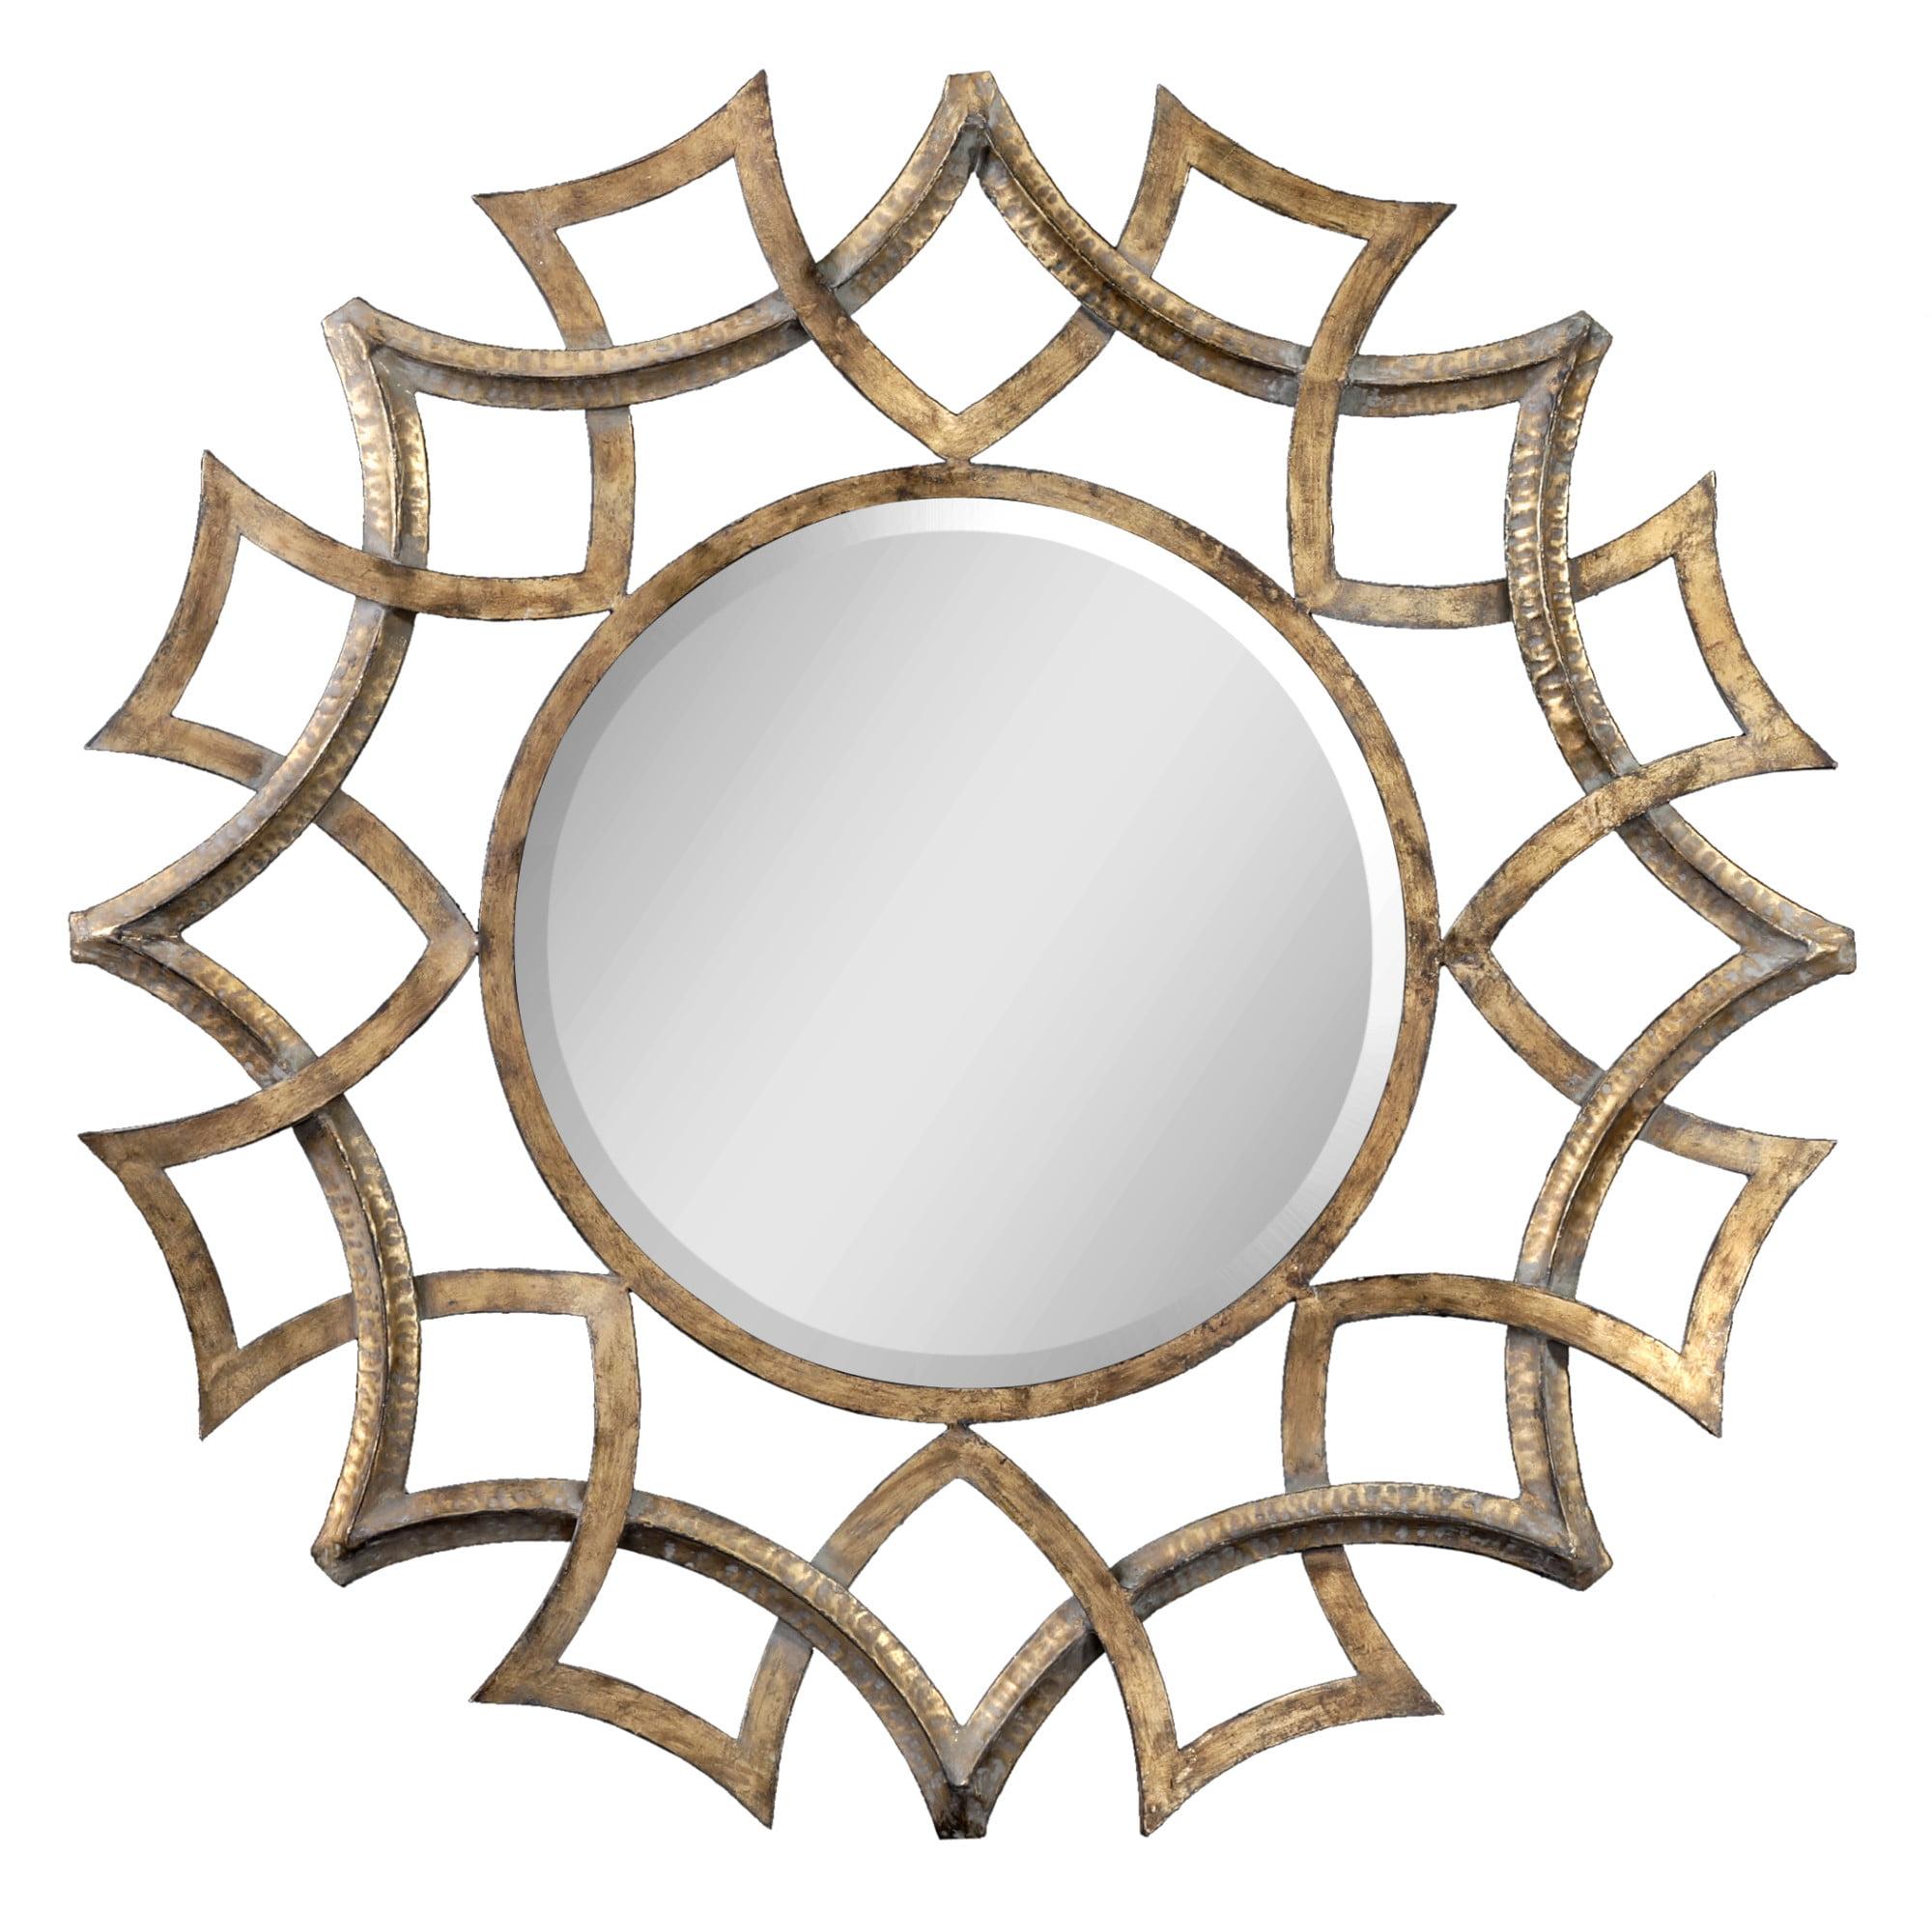 Uttermost 12730 B Demarco Sunburst Inspired Ornate Round Large Wall Mirror Walmart Com Walmart Com